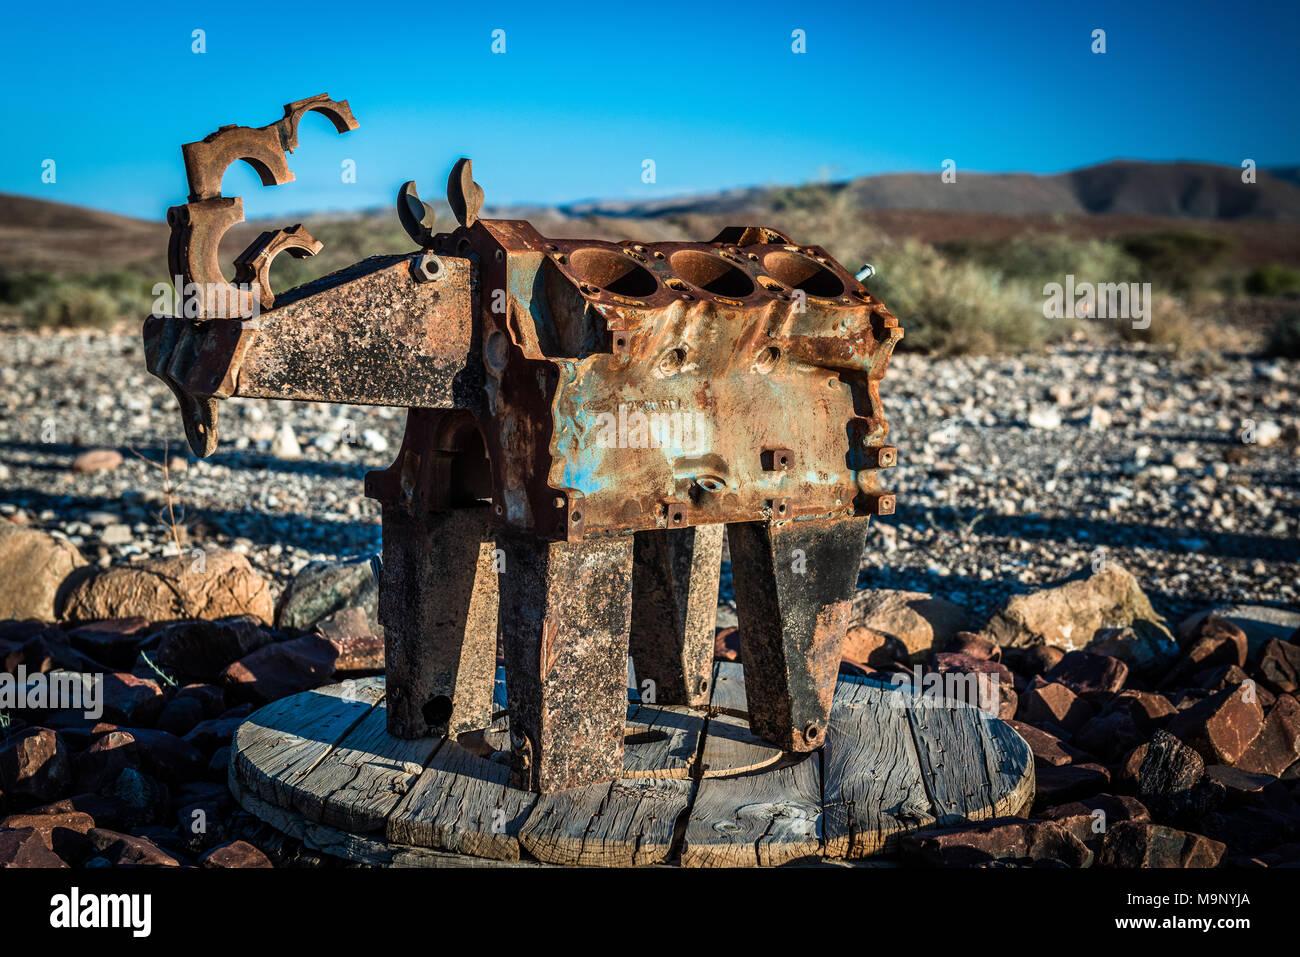 A rhino sculpture at Namibia's Tsauchab river camp Stock Photo